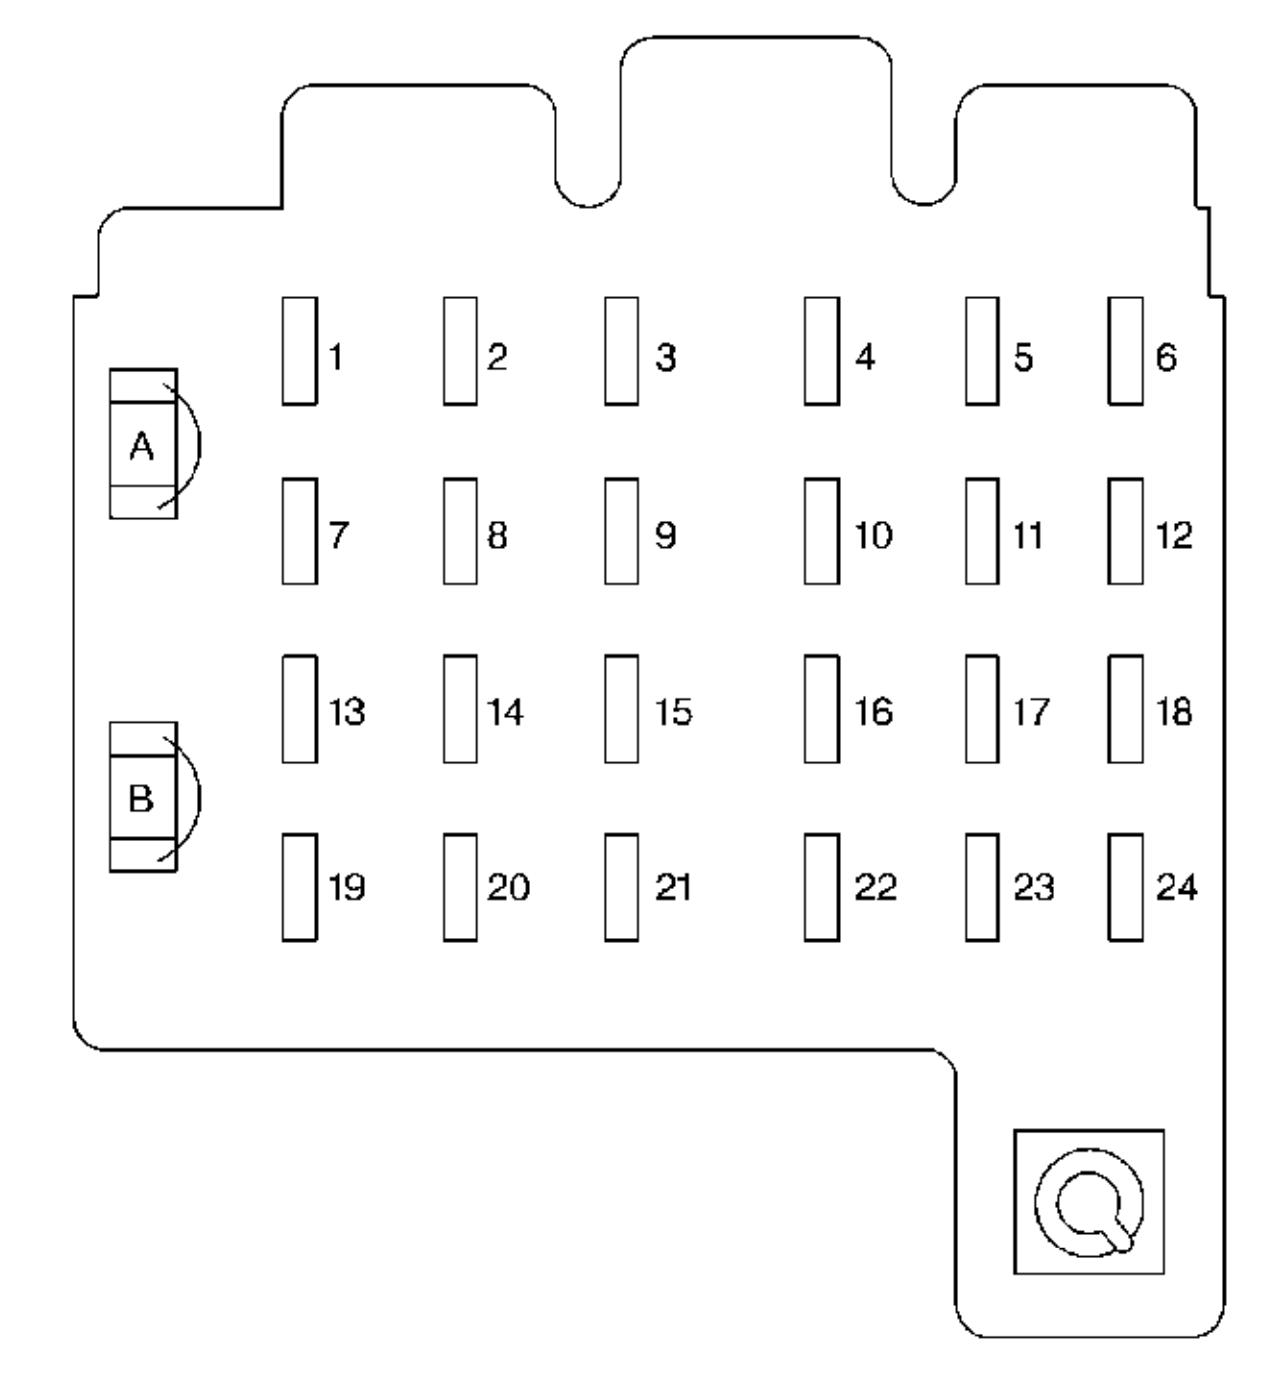 99 Tahoe Fuse Diagram Wiring Diagrams Regular A Regular A Miglioribanche It